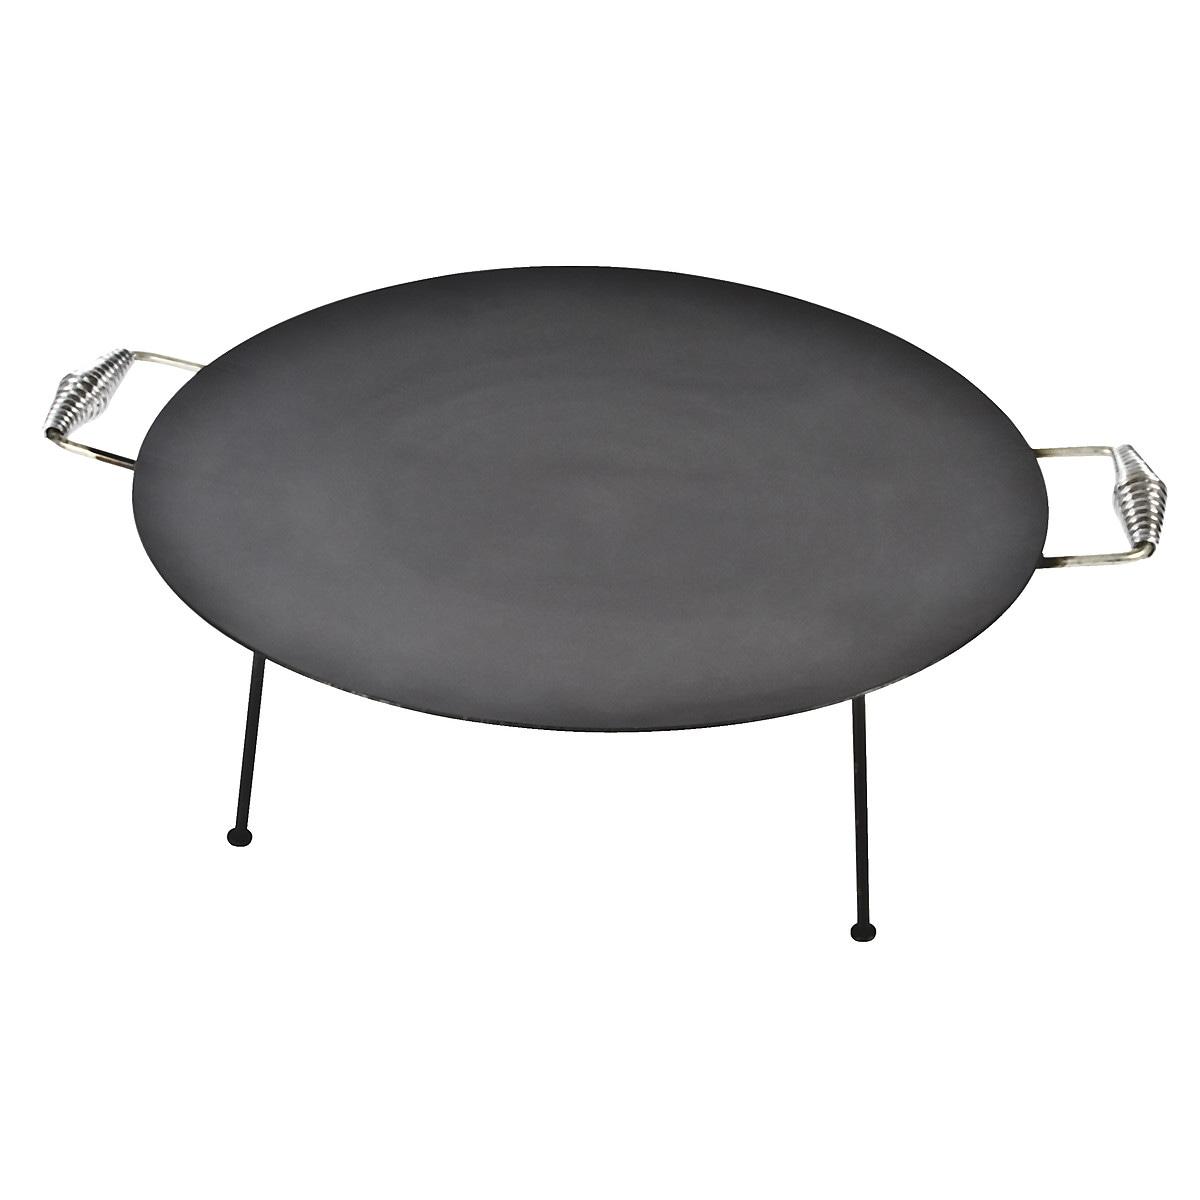 Hallmark BBQ Griddle Pan